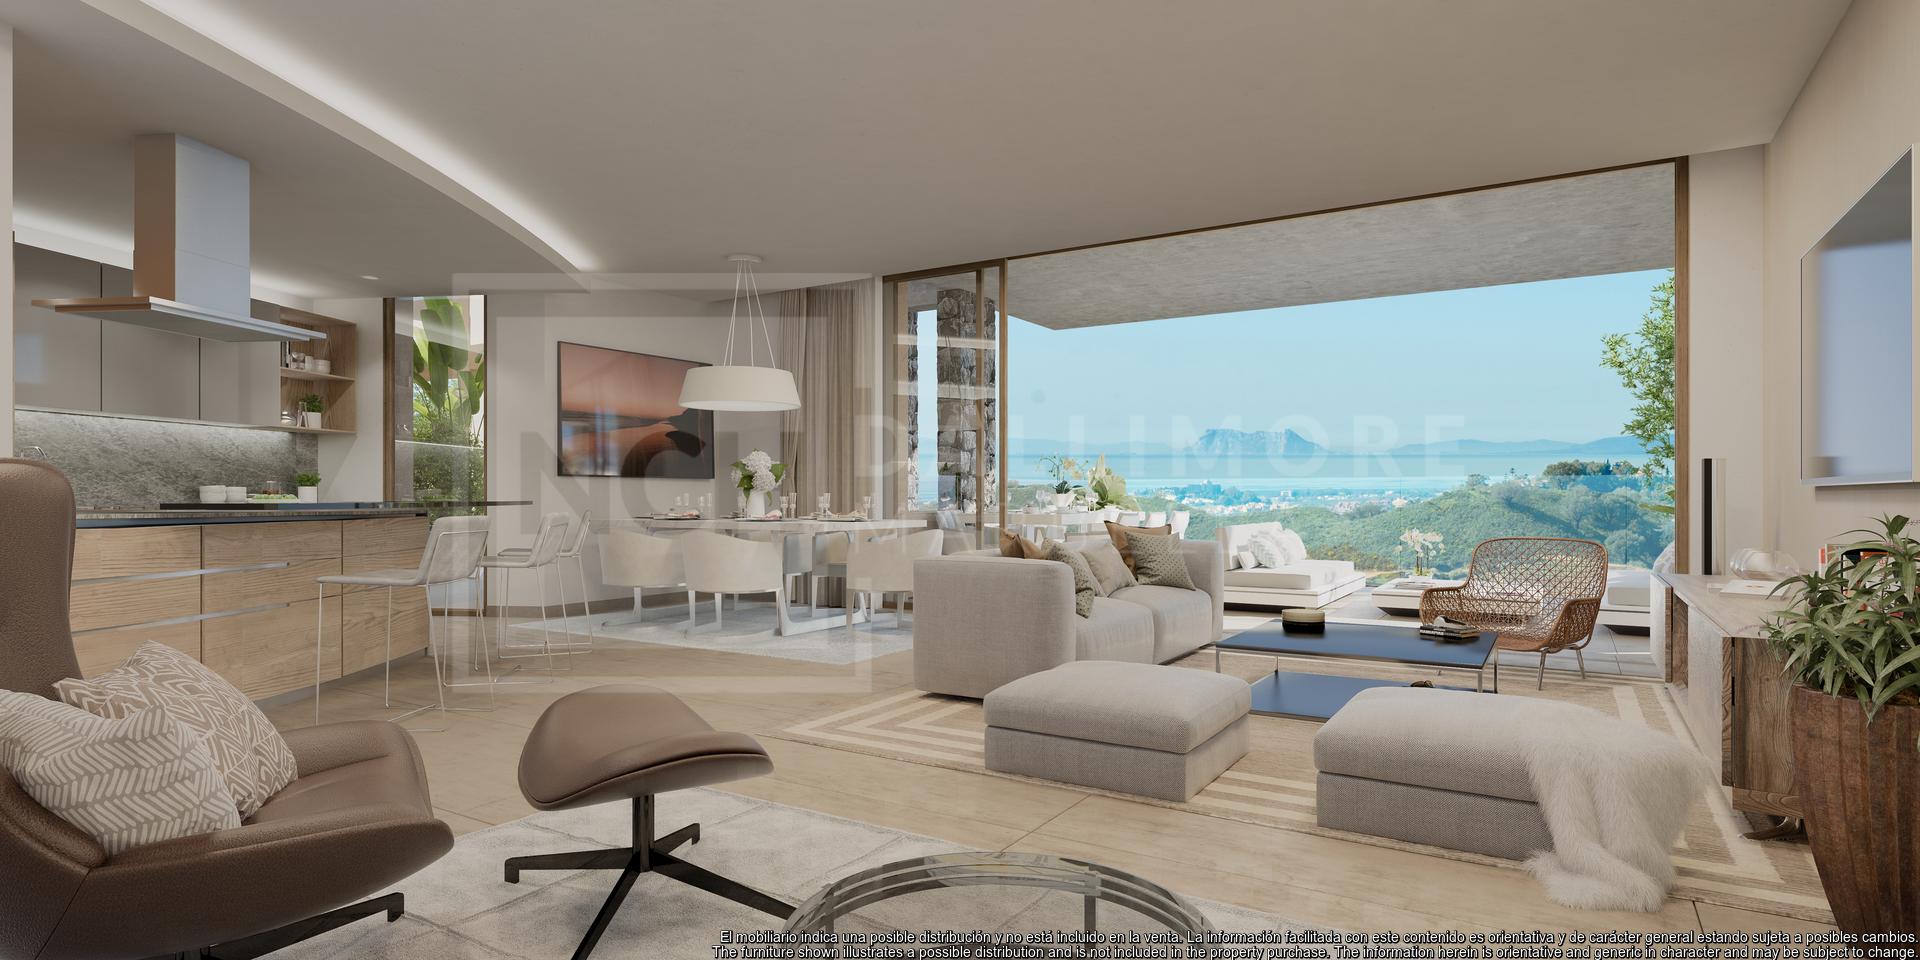 Ground Floor Apartment Real de La Quinta, Benahavis – NEWA6691